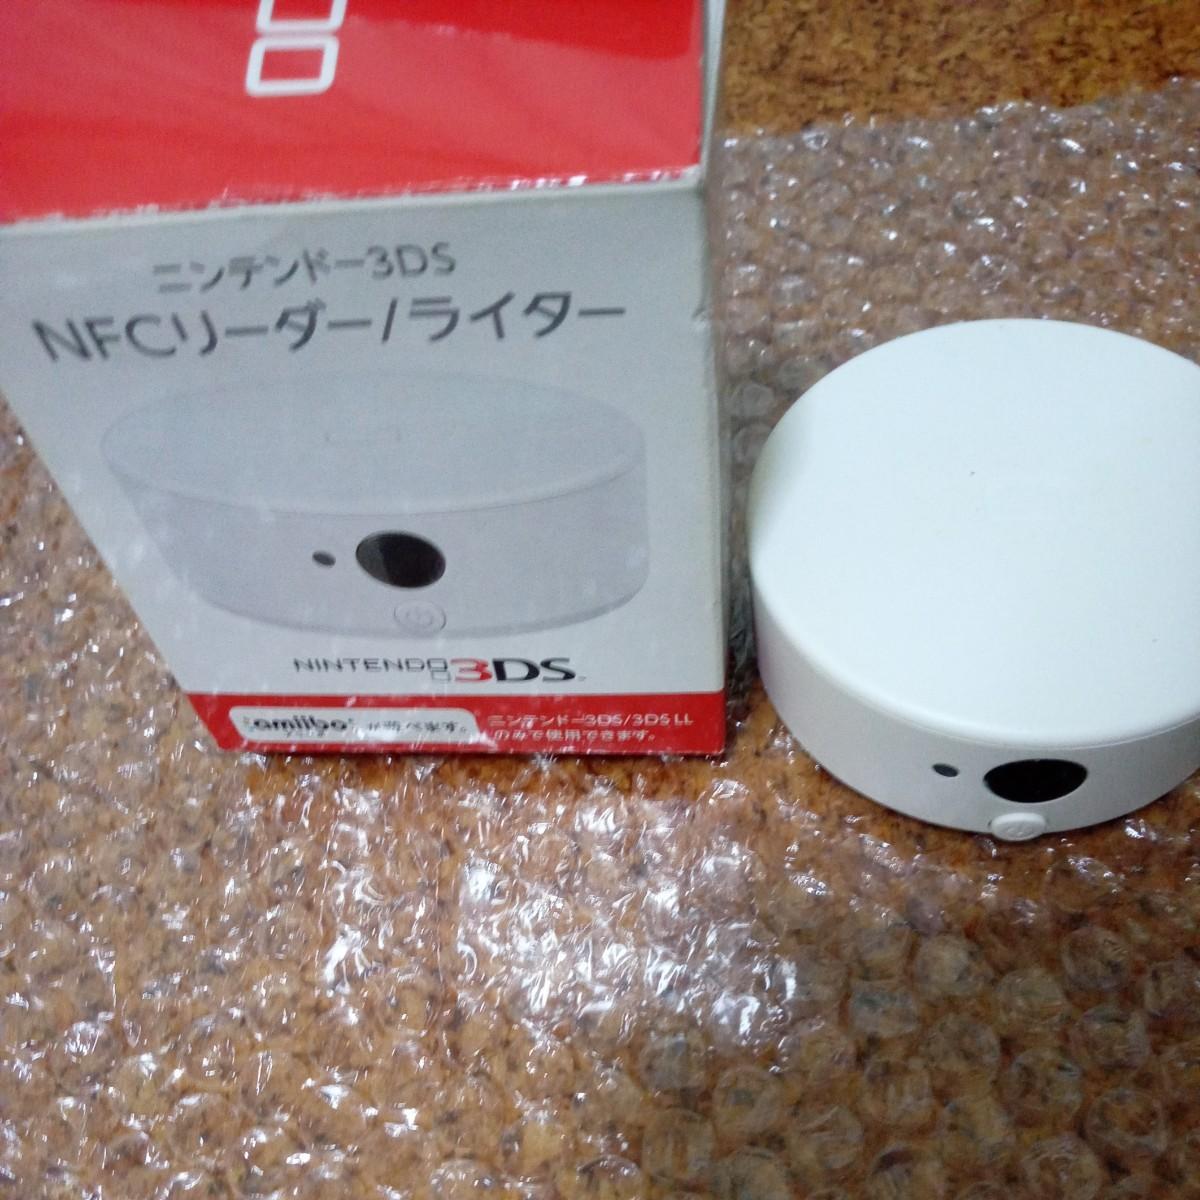 3DS NFCリーダー